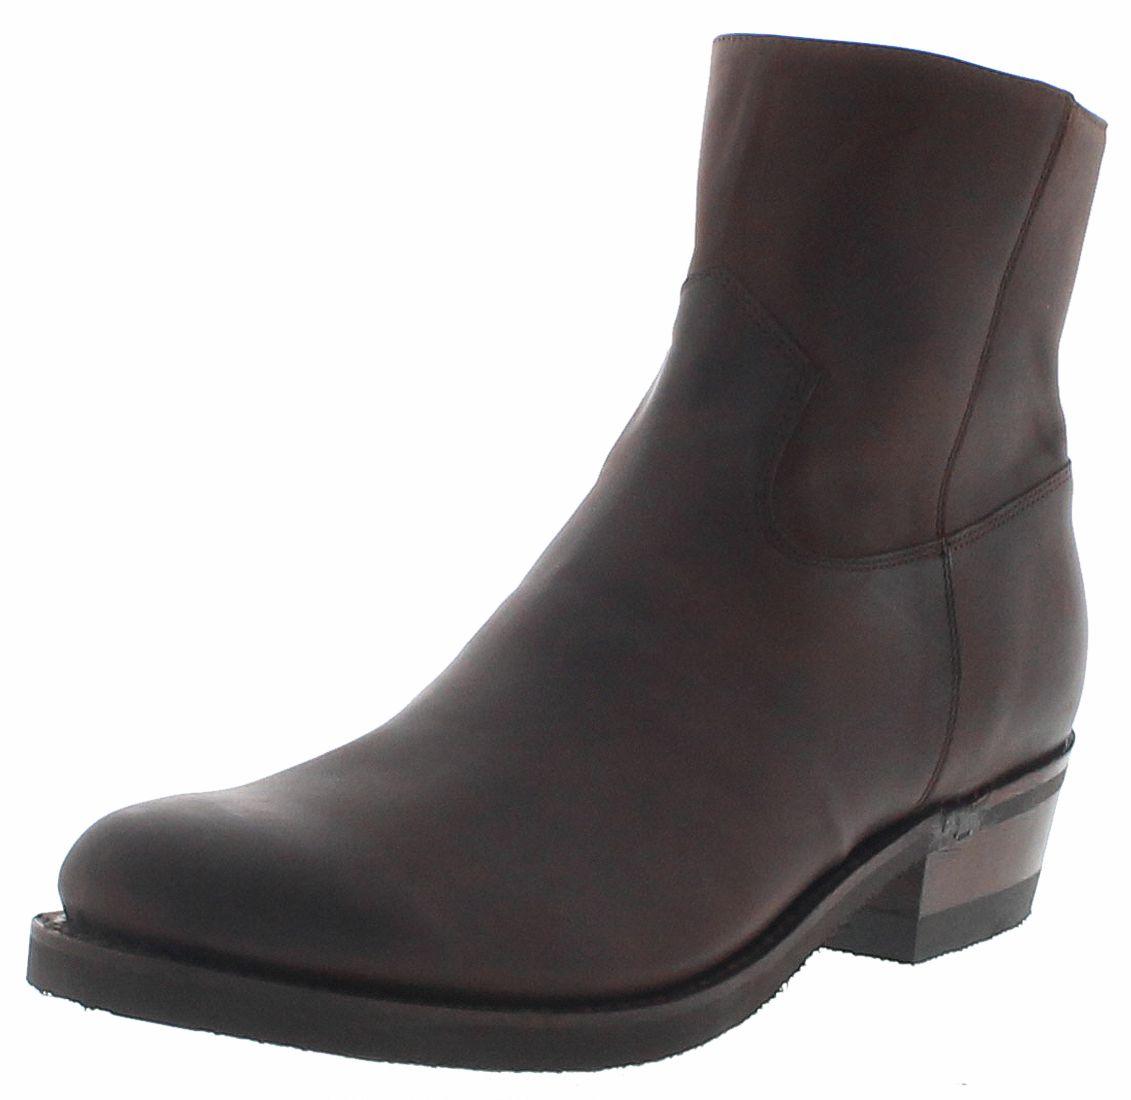 Sendra Boots 4948 LAZO Chocolate Mens Western Stifelette - brown